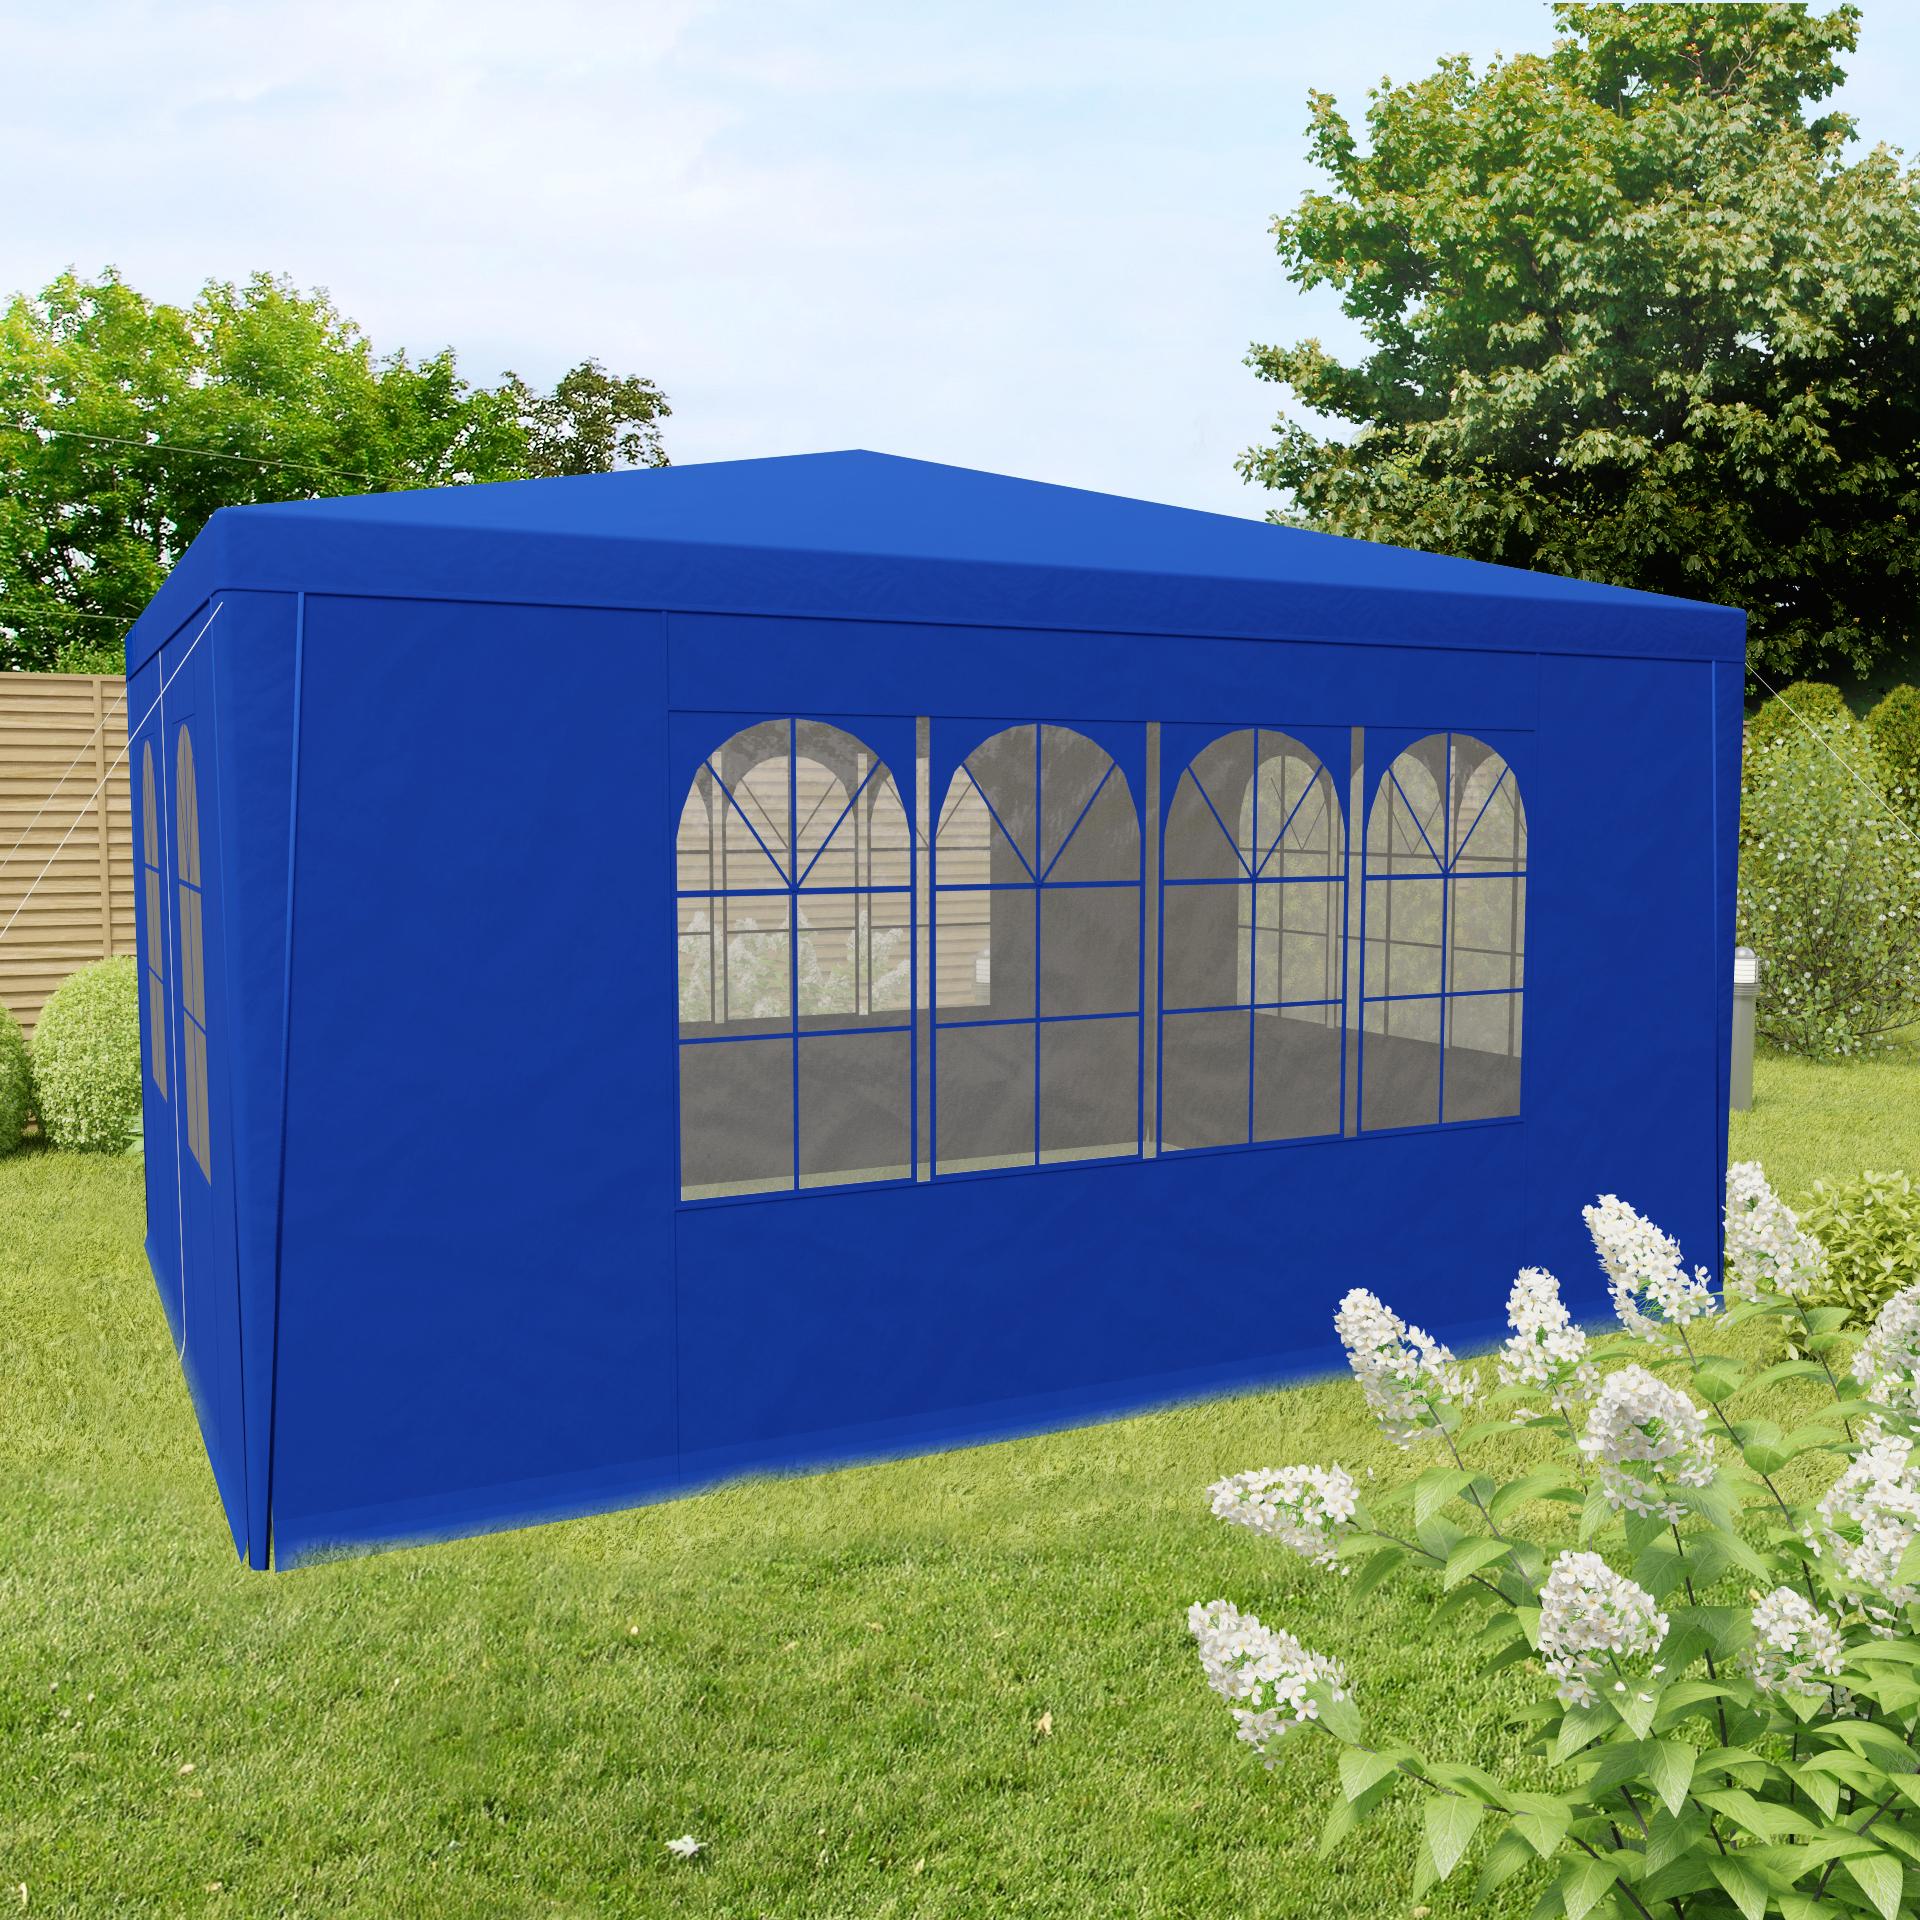 pavillon gartenpavillon partyzelt zelt garten 3x4 blau. Black Bedroom Furniture Sets. Home Design Ideas